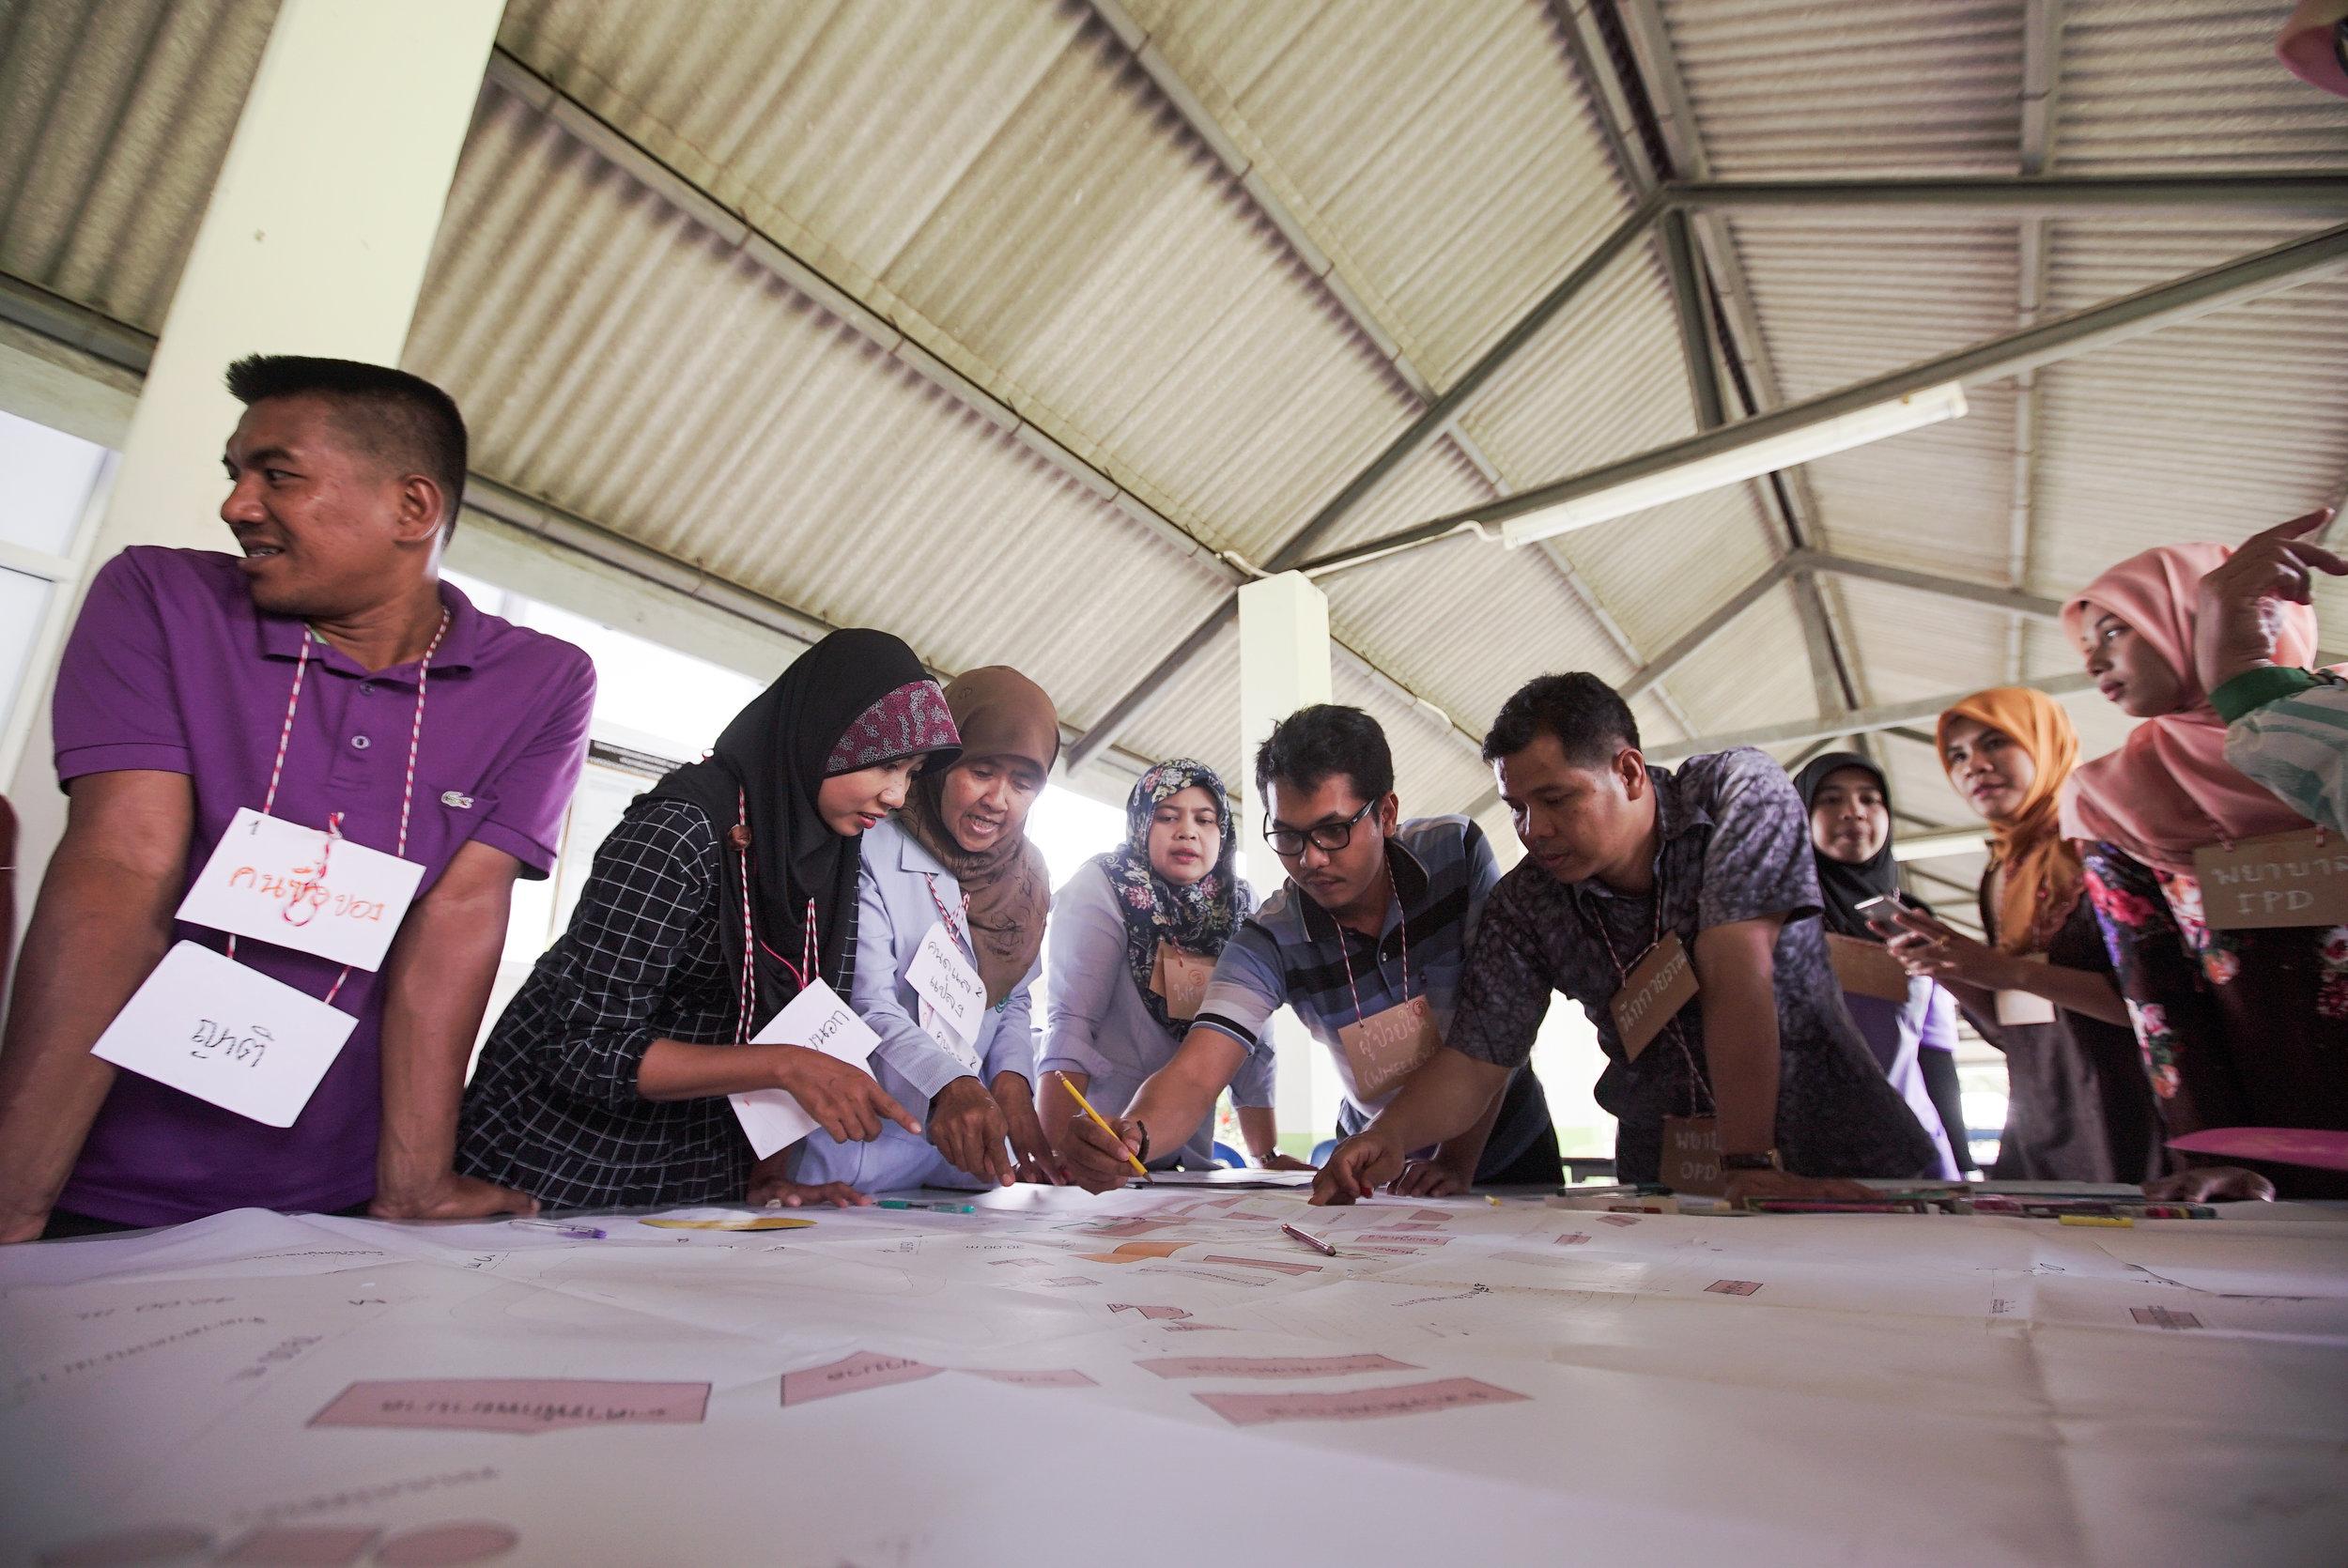 King's Hospitals project: Renovating Yi-ngo community hospital in Naratiwat using Universal Design